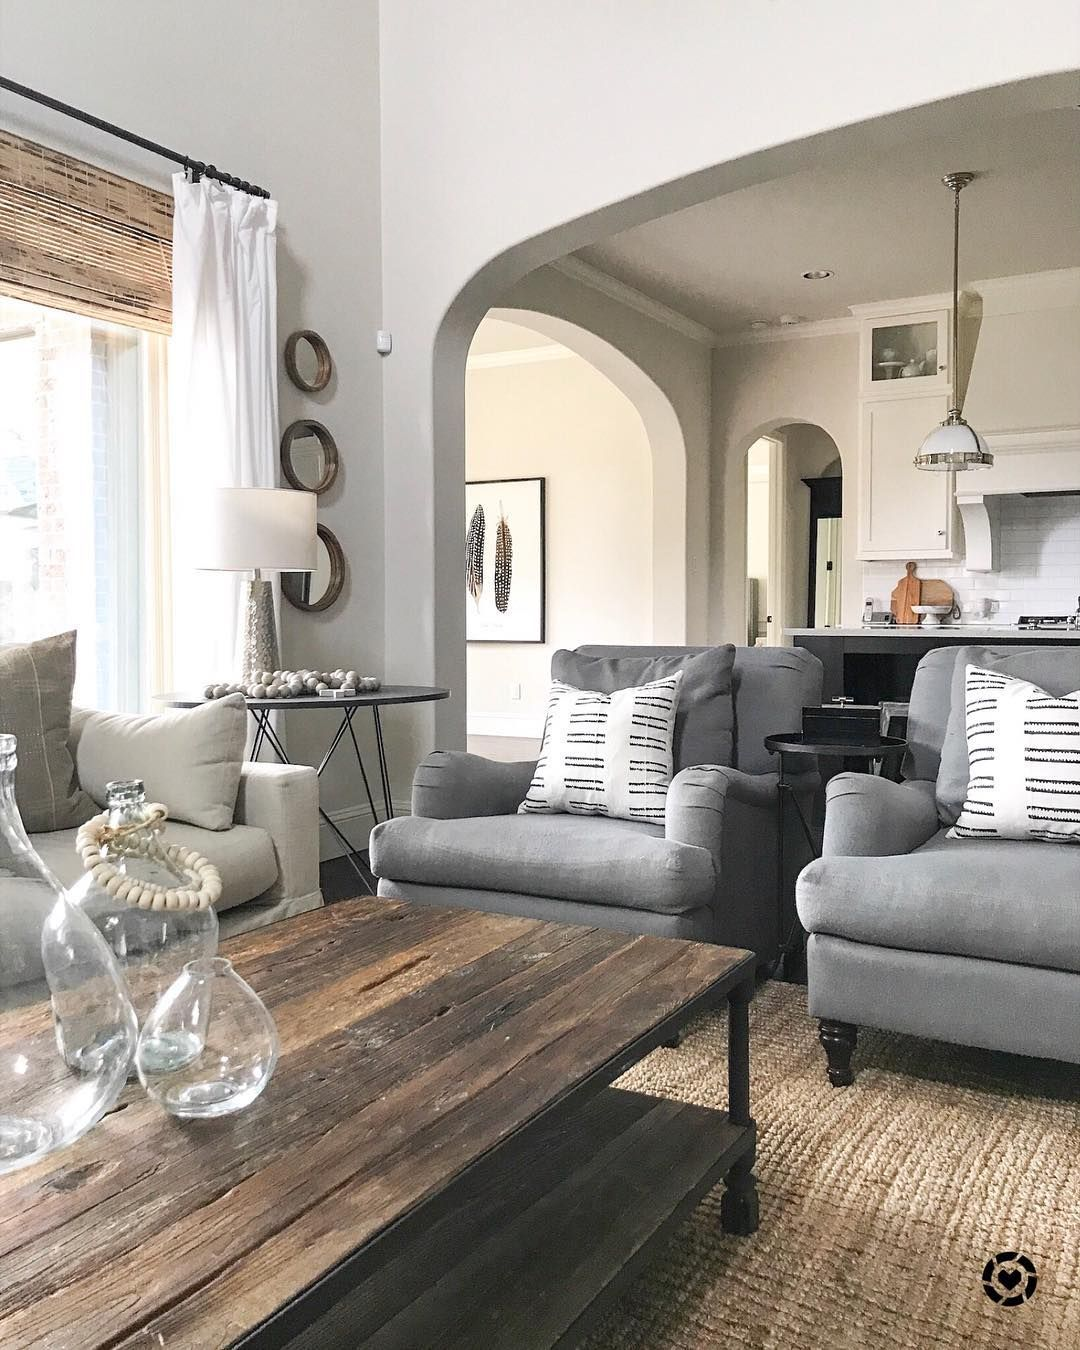 Gray Chairs, Jute Rug, White Curtains, Restoration